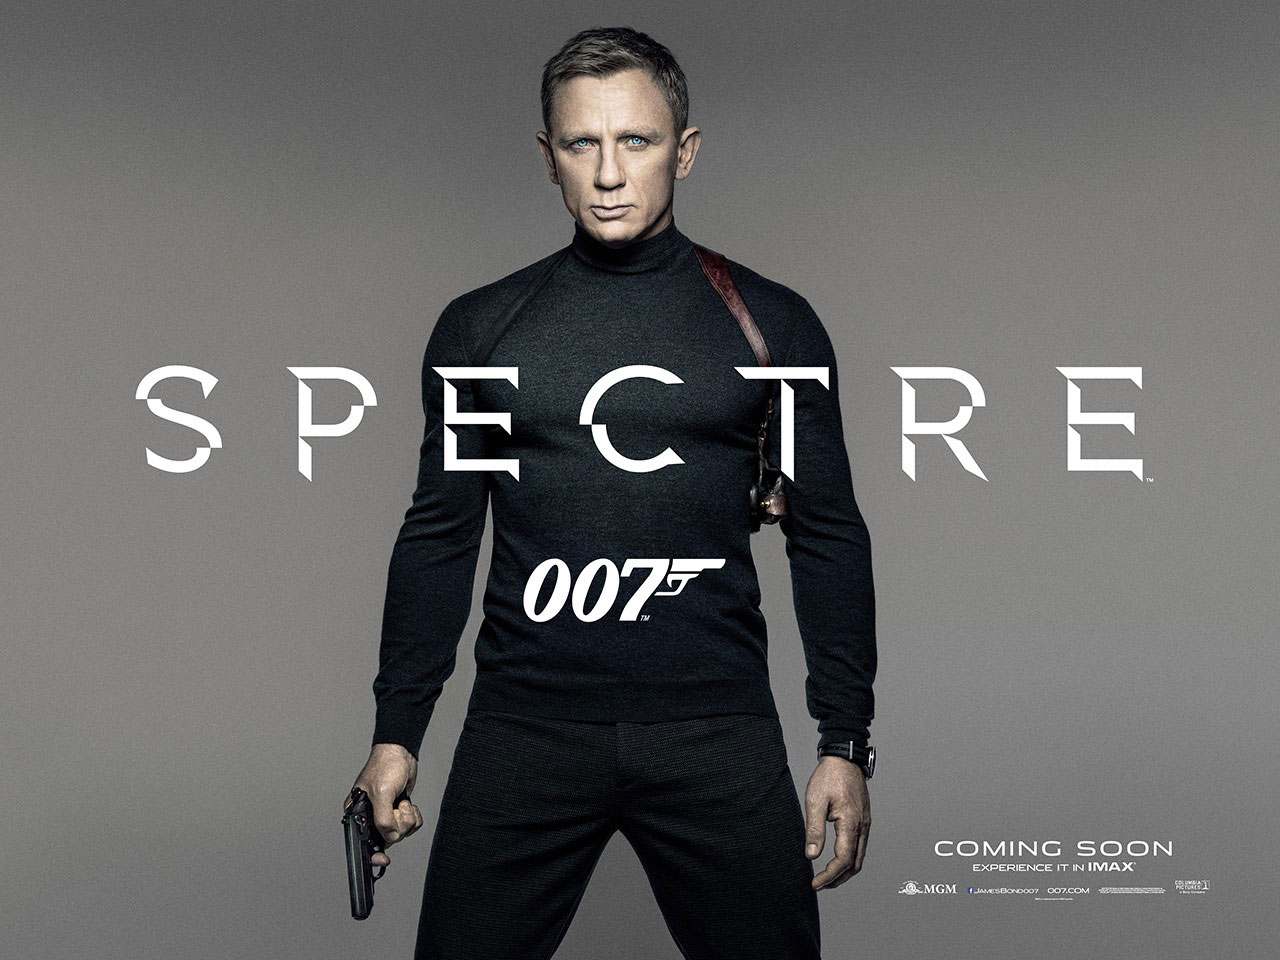 spectre-teaser-poster-daniel-craig-film-images